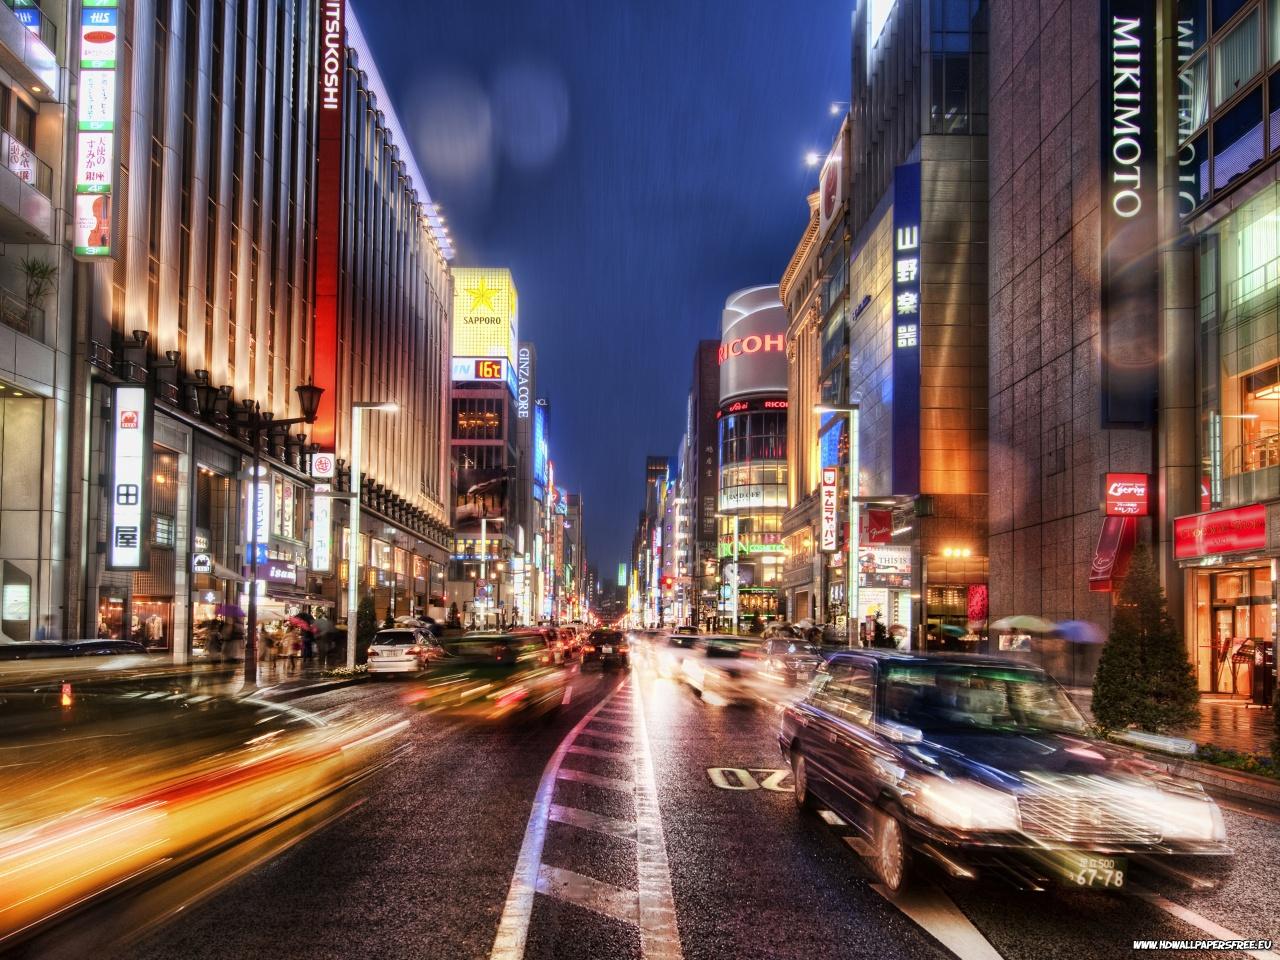 Download Tokyo Street at Night wallpaperdesktopiPad background 1280x960